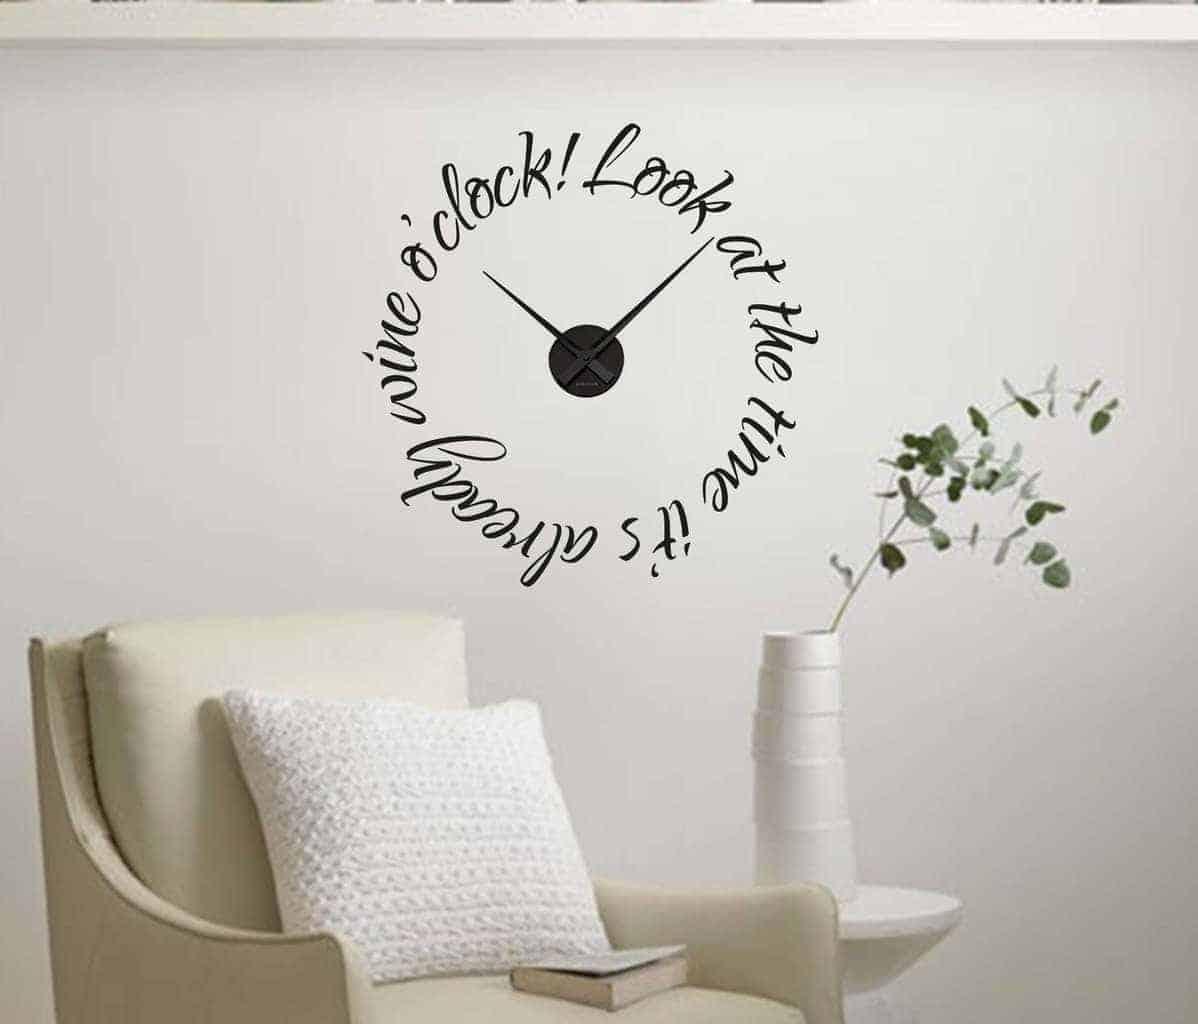 Wall Decal Of Wine OClock Wall Art Decal Clock - Wall decals clock